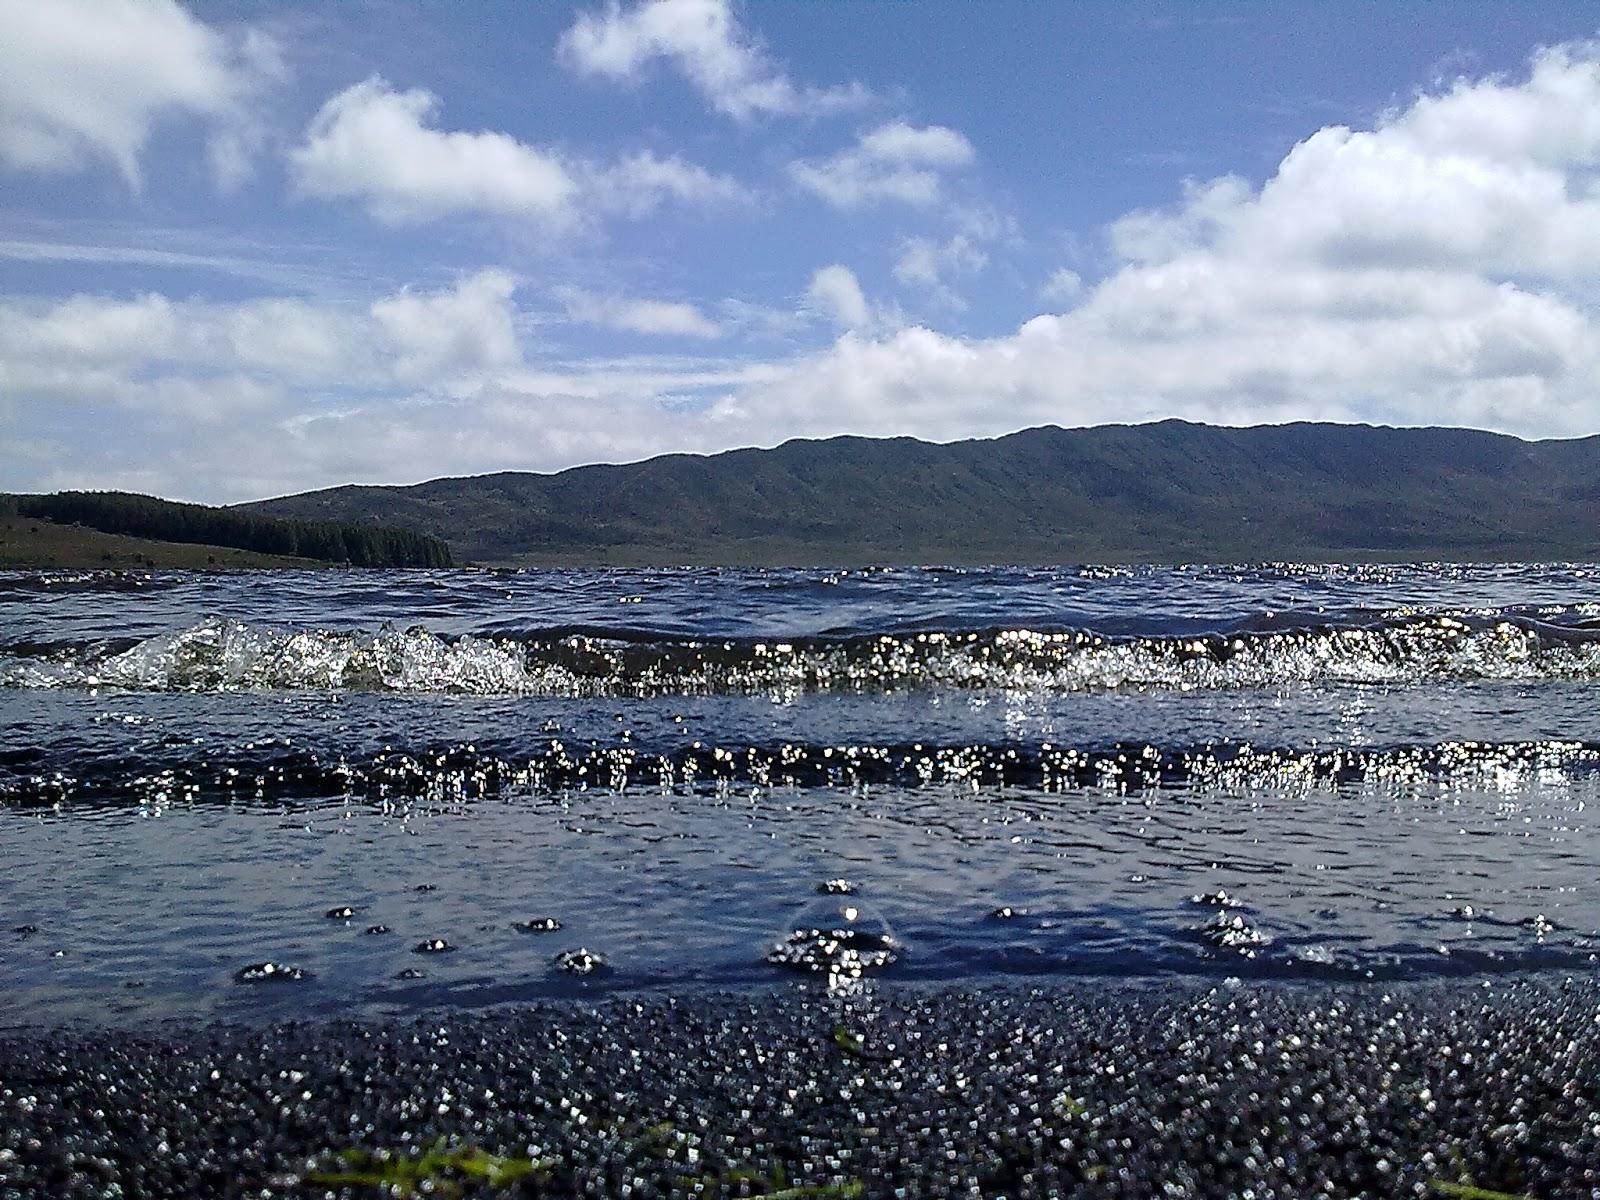 Represa en Samacá colombia | Gabotechv